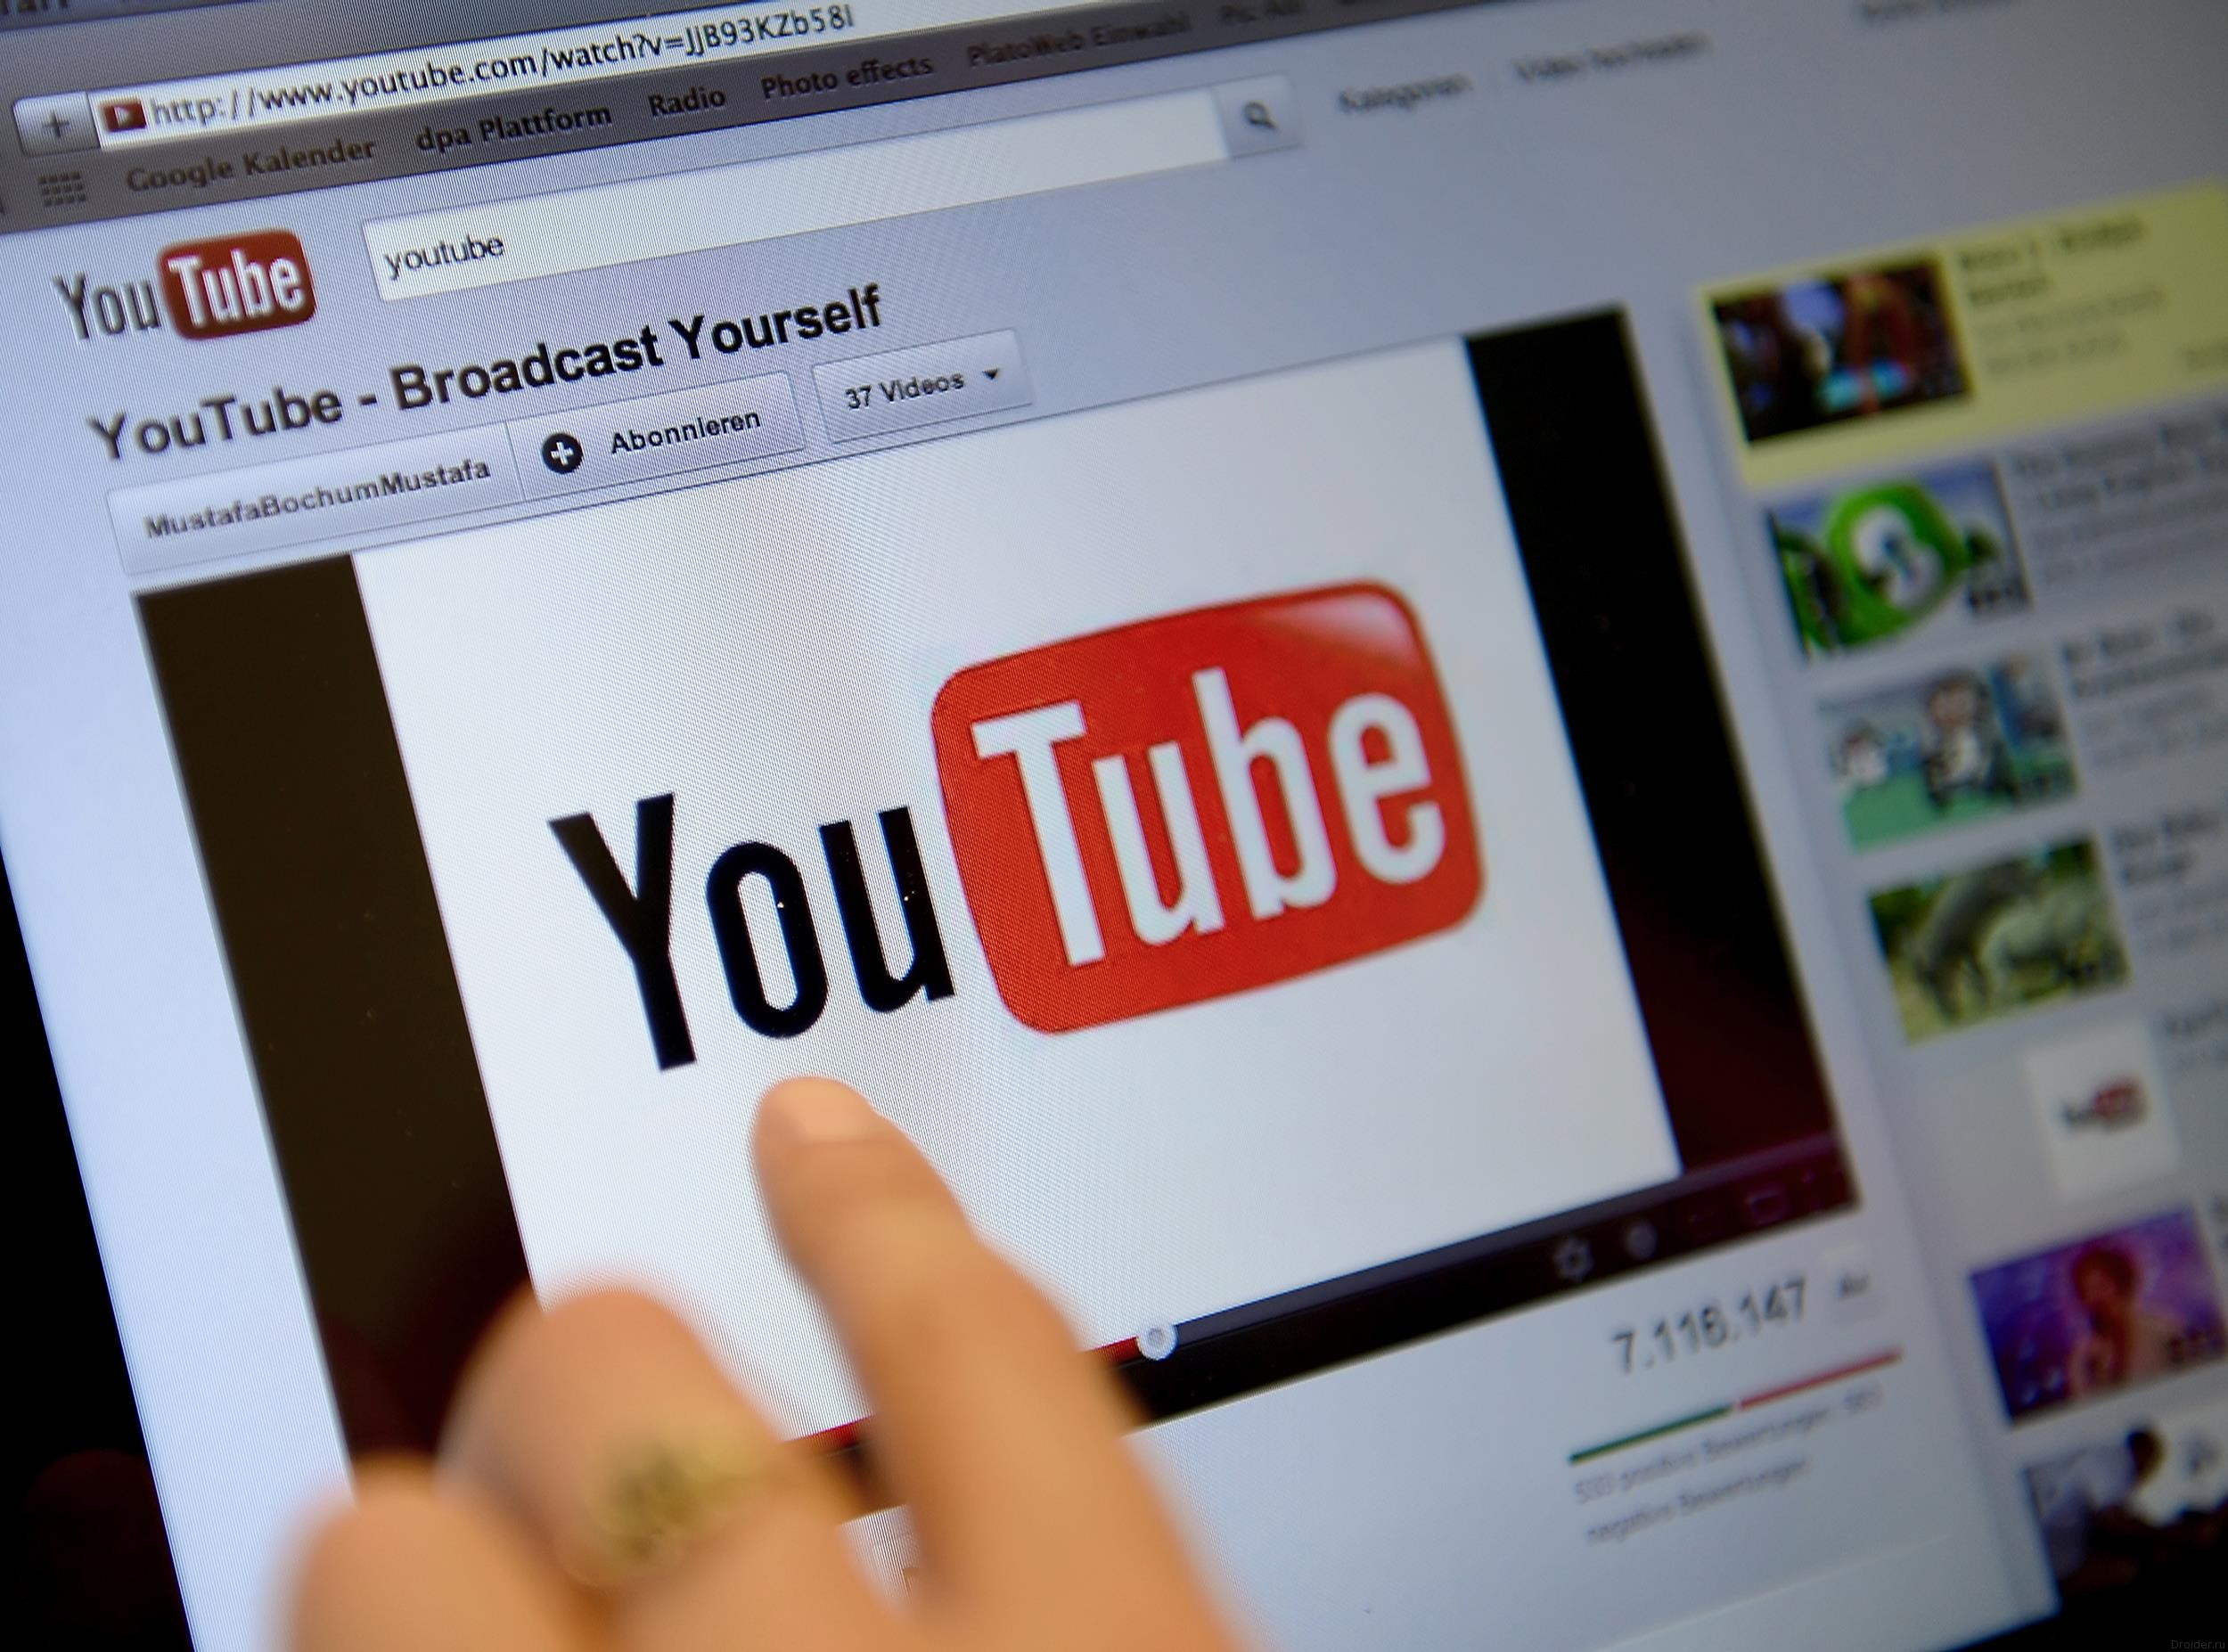 Иллюстрация на тему Программа для скачивания видео с Youtube на компьютер